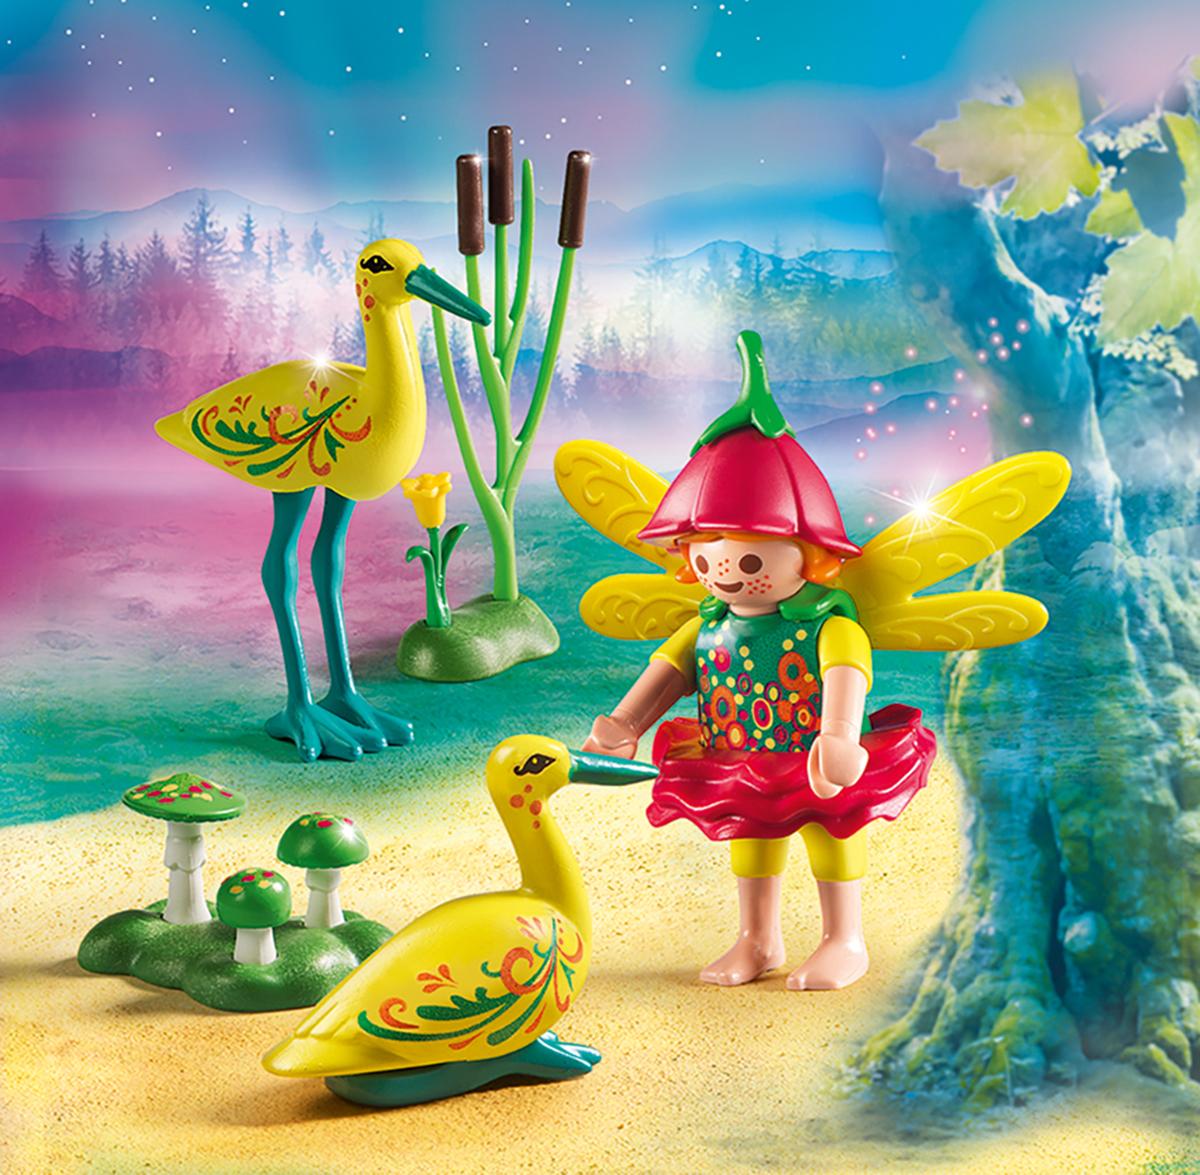 Playmobil Игровой набор Феи Девочка-фея с аистами